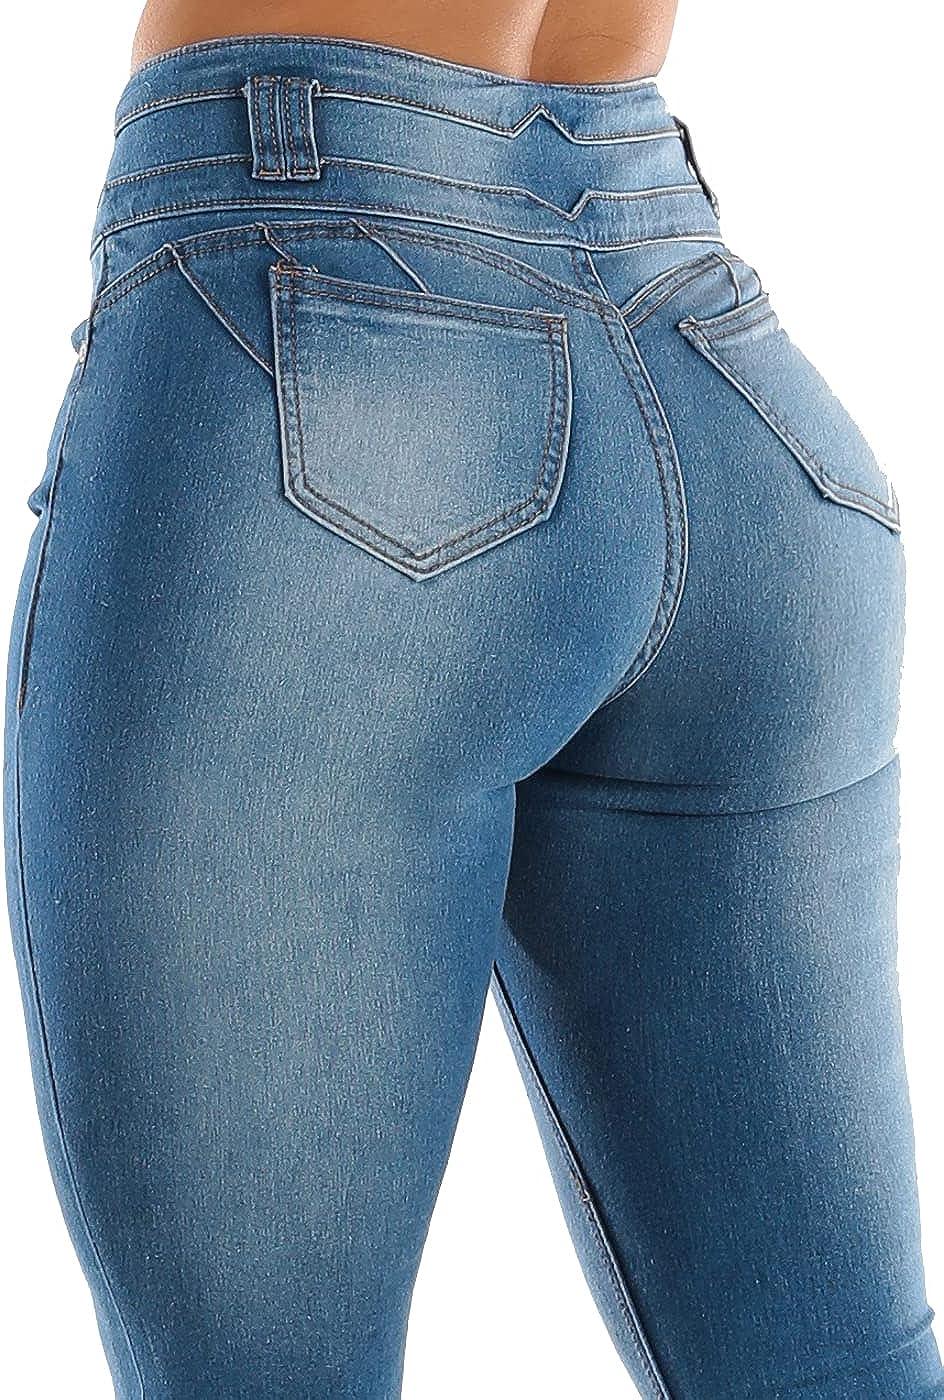 Colombian Women/'S Stretch Skinny Leg Long Pants Butt Lifting Denim Pencil Jeans